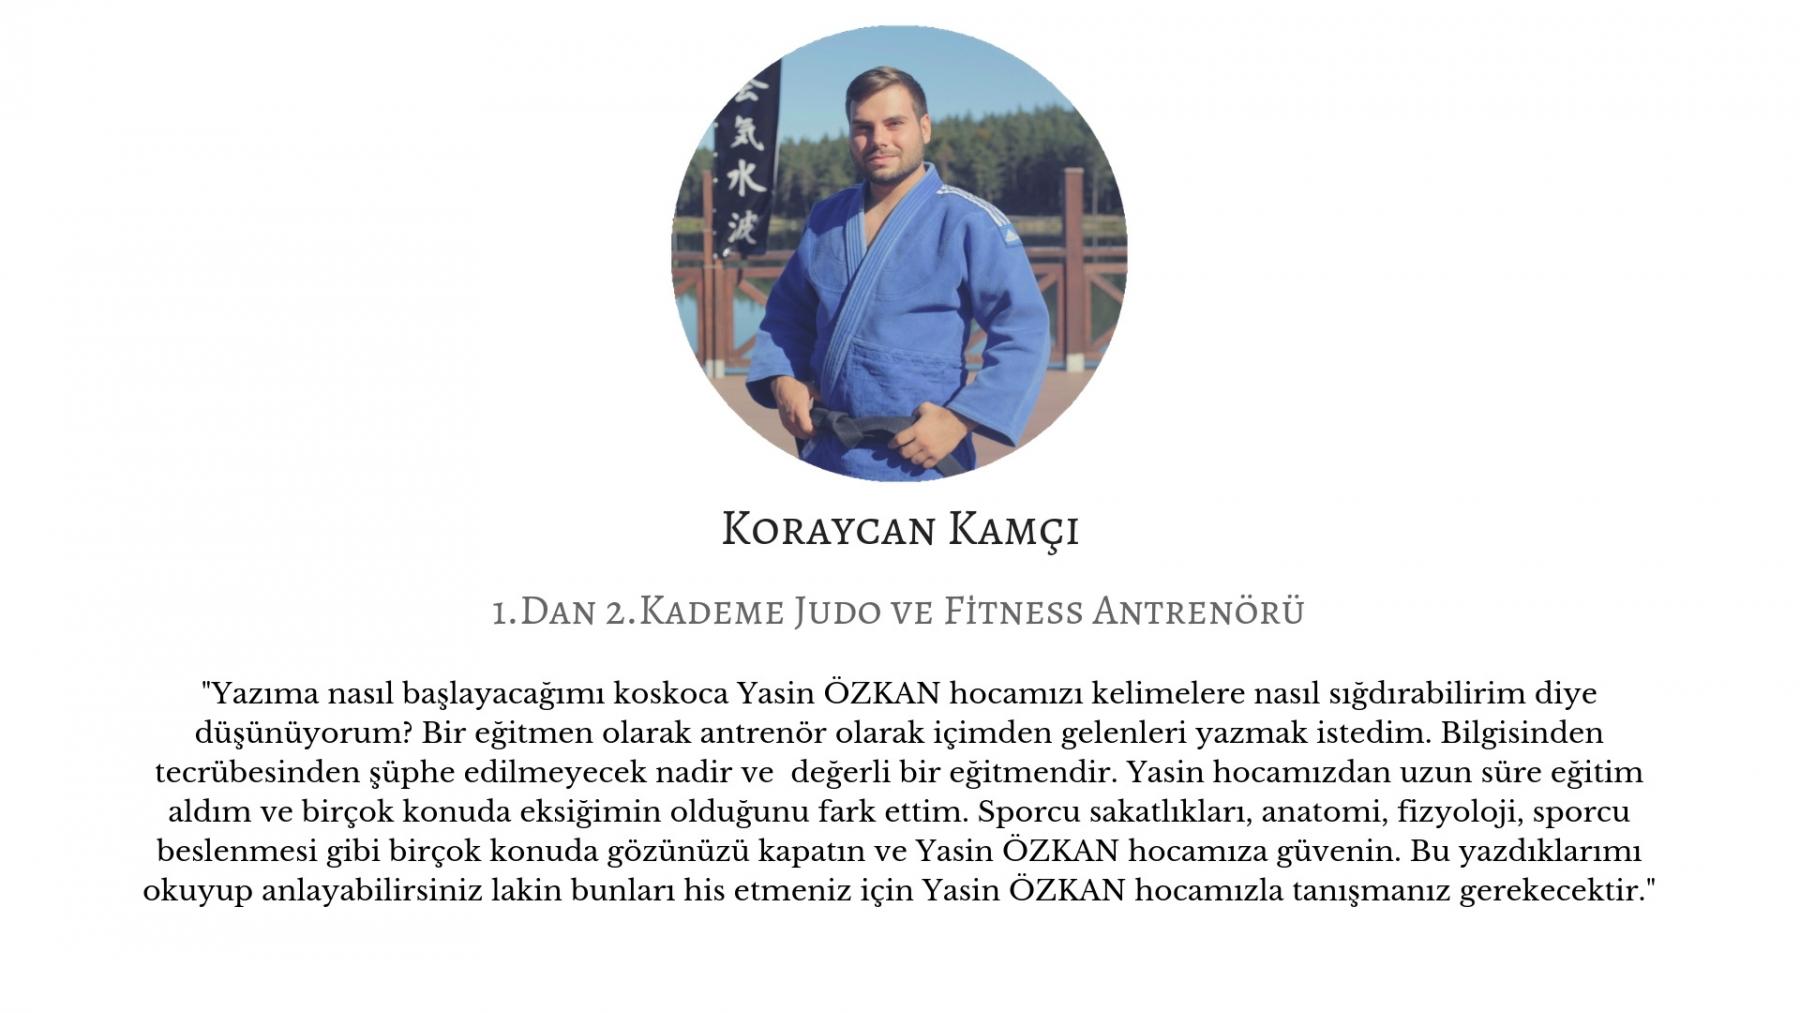 Koraycam Kamçı - Judo Antrenörü yasin ozkan mma bjj izmir jiujitsu muay thai fitness pt